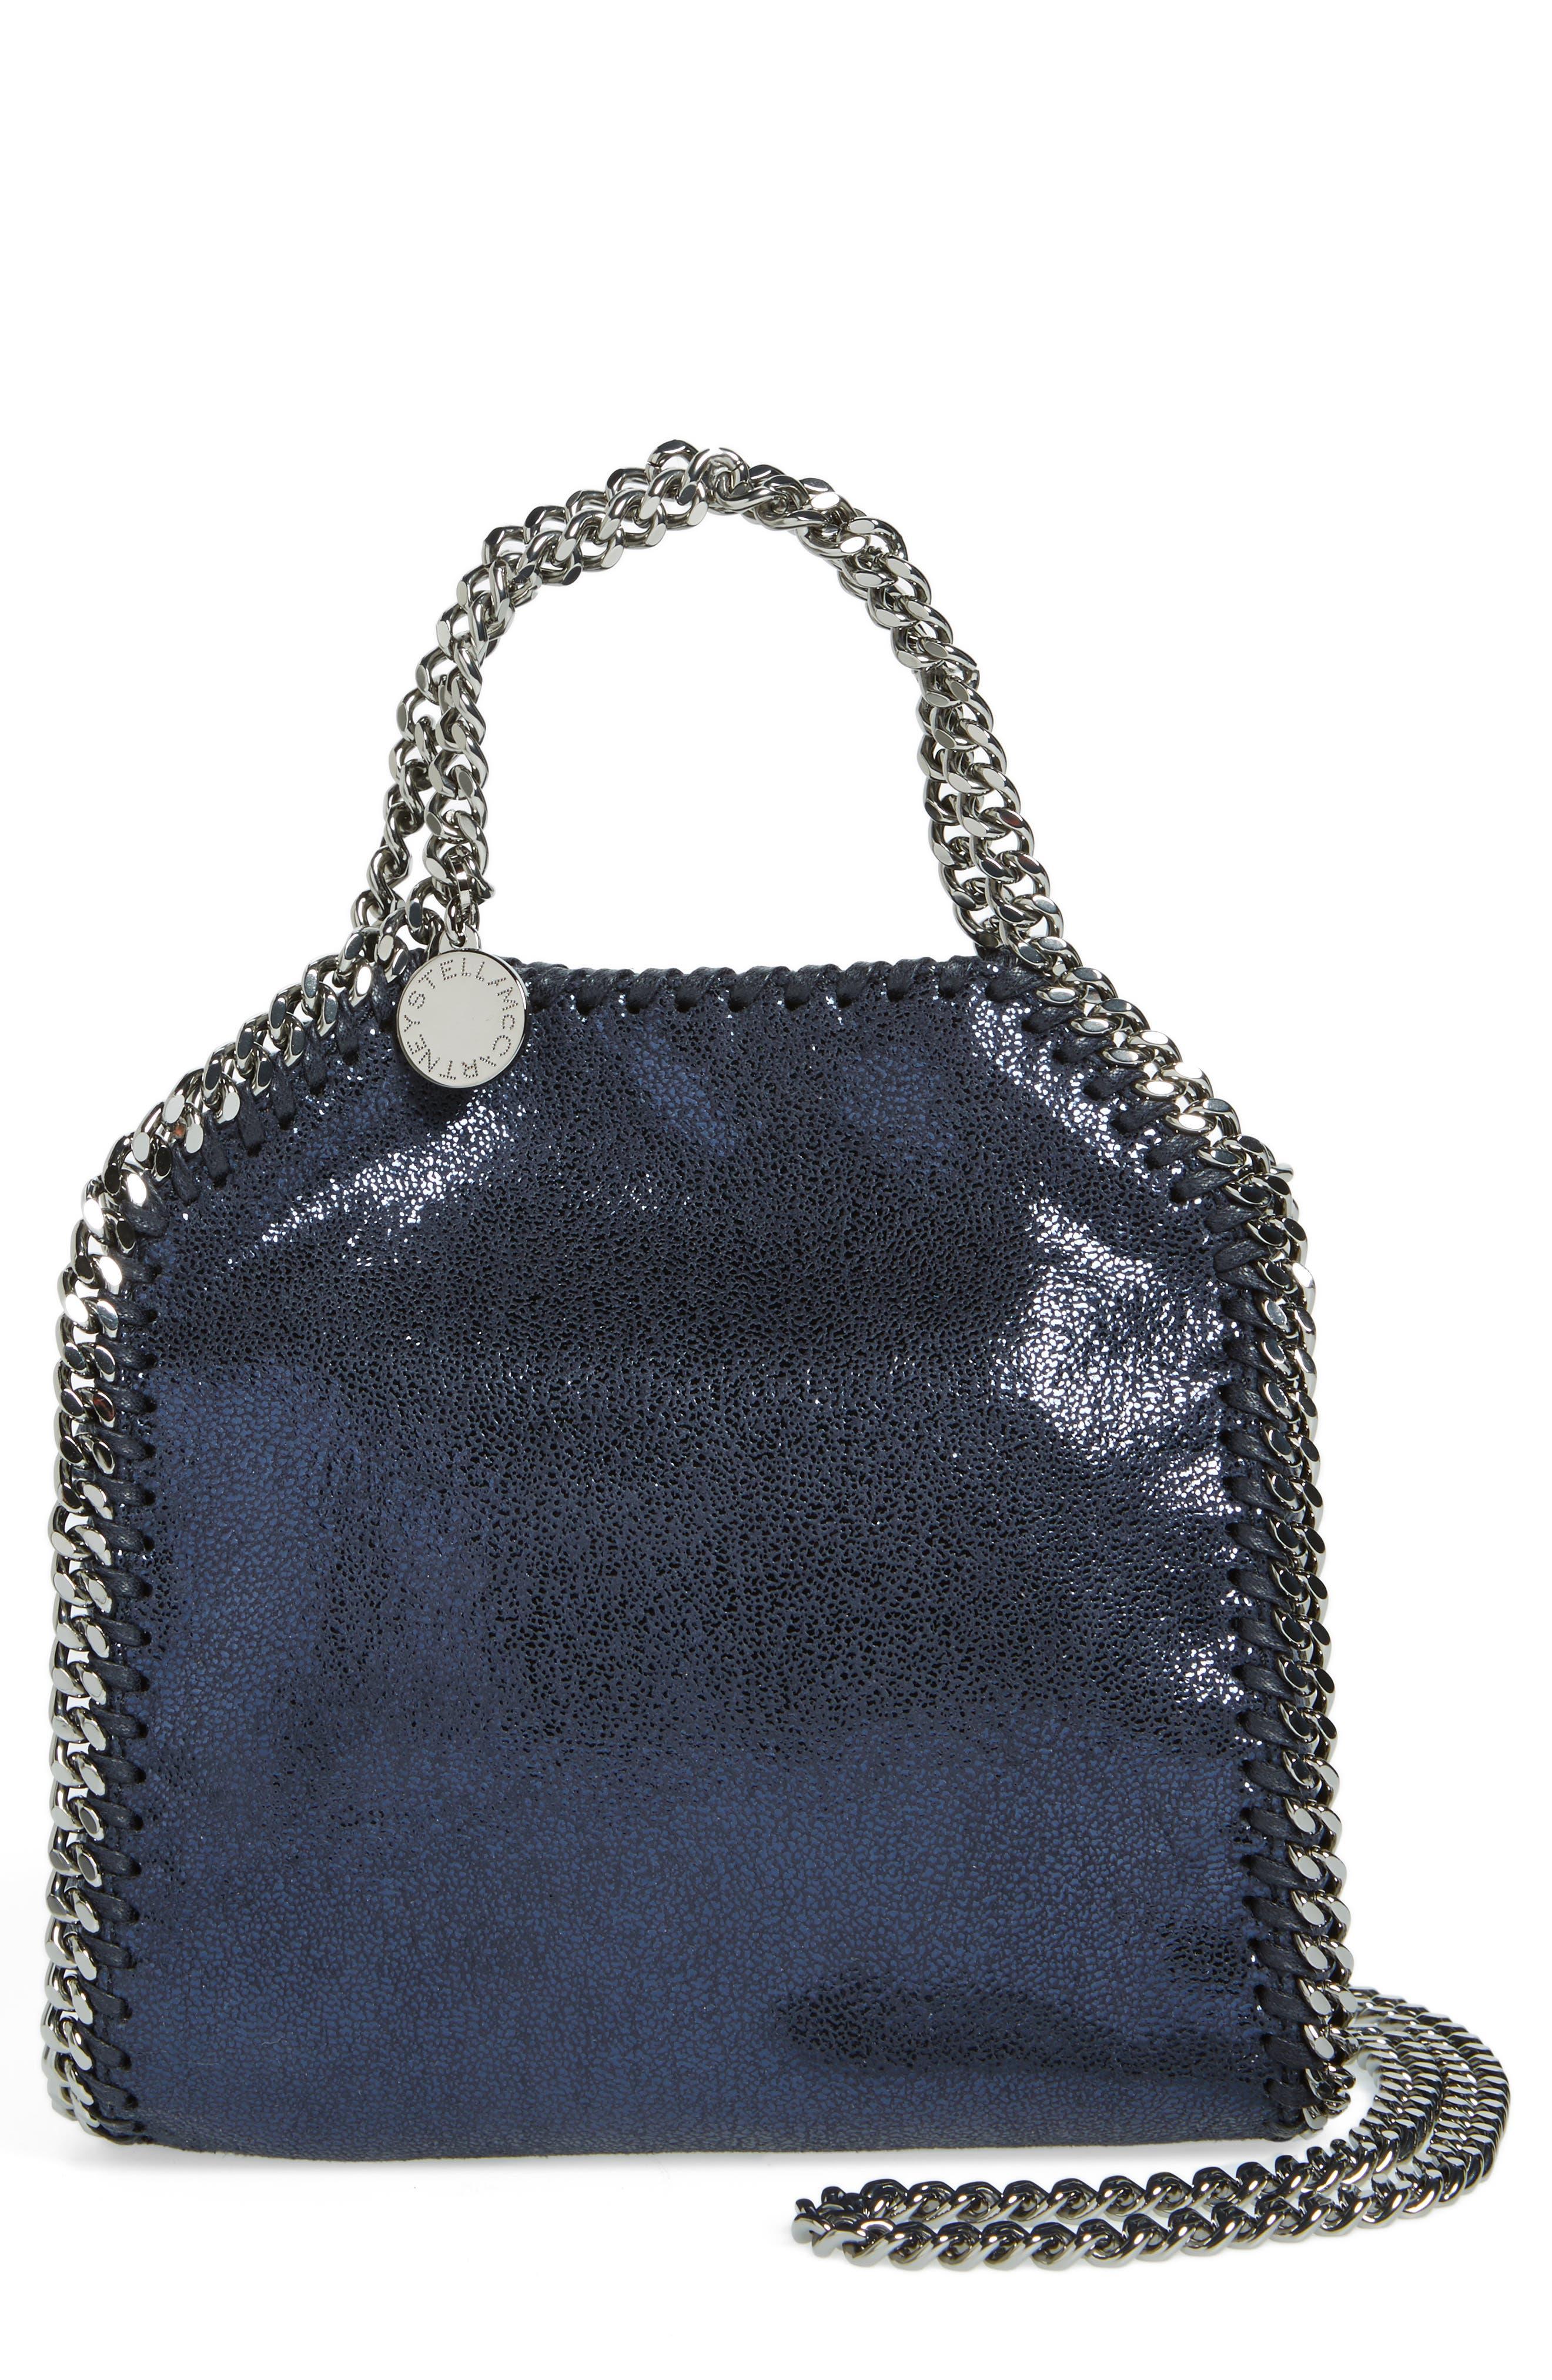 'Tiny Falabella' Metallic Faux Leather Crossbody Bag,                         Main,                         color, Ink